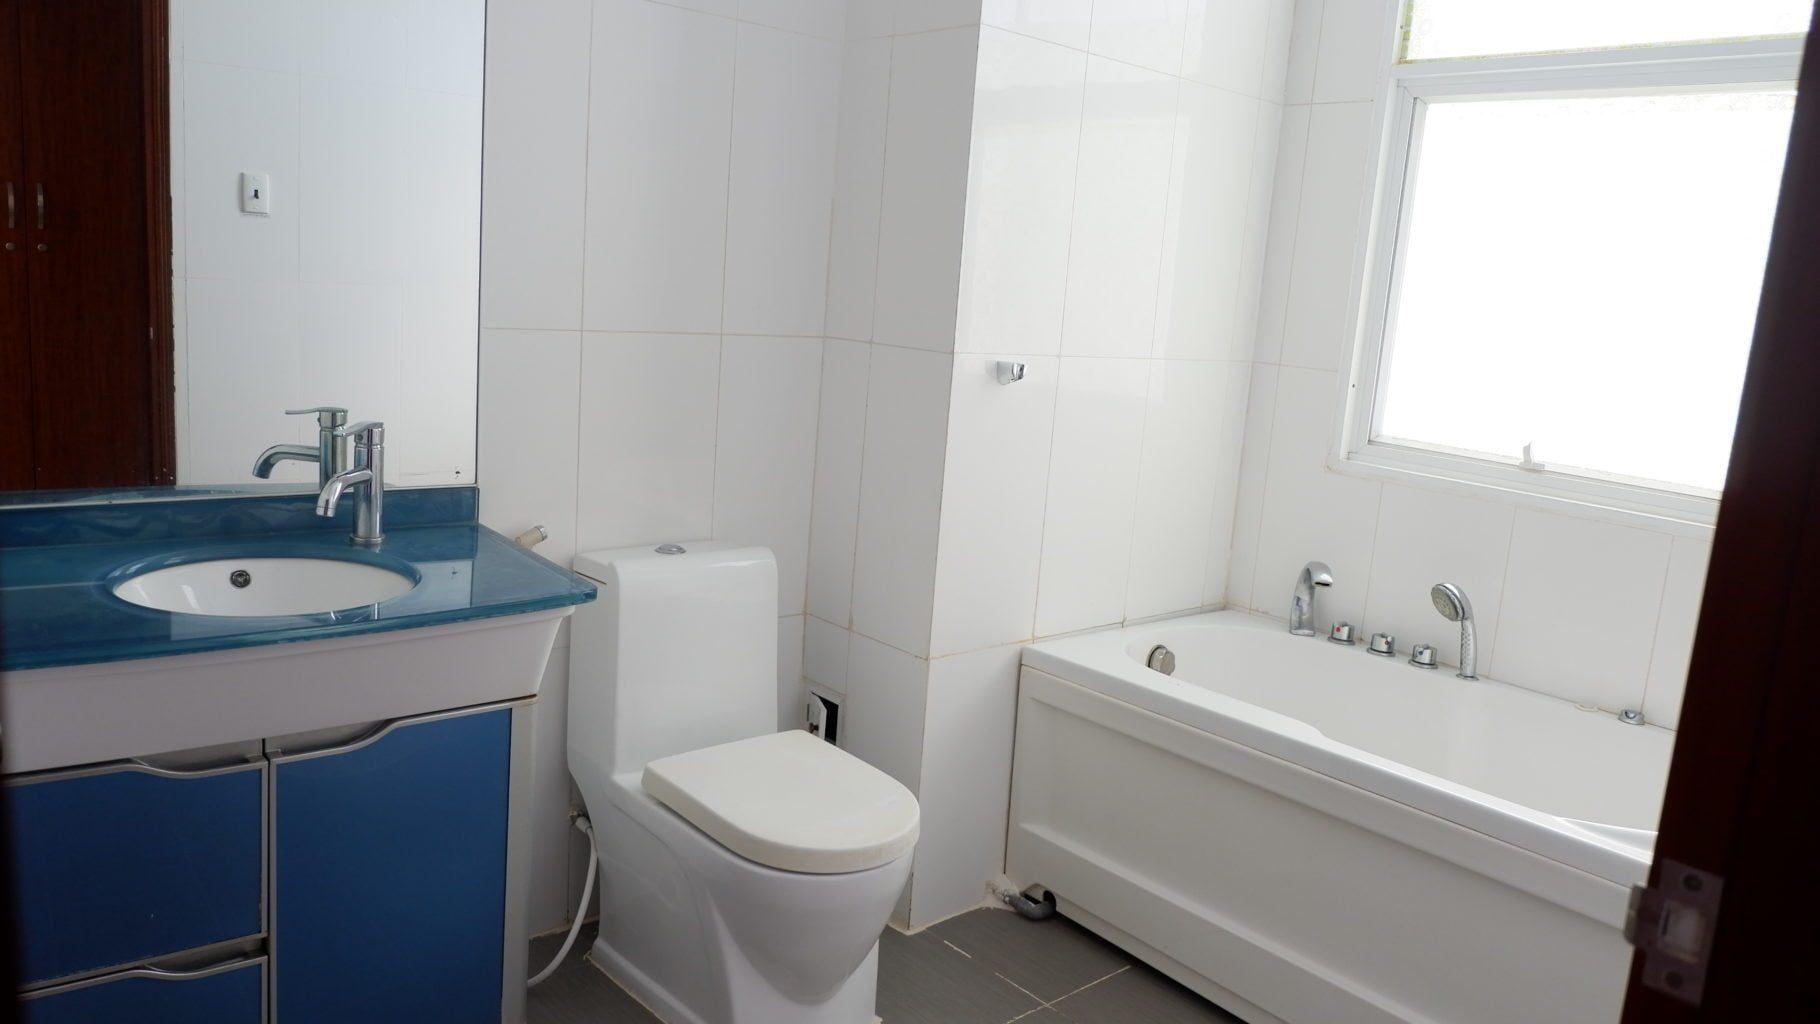 toilet cua biet thu vung tau ali 9 duoc dat trong phong nen rat tien loi, sach se.